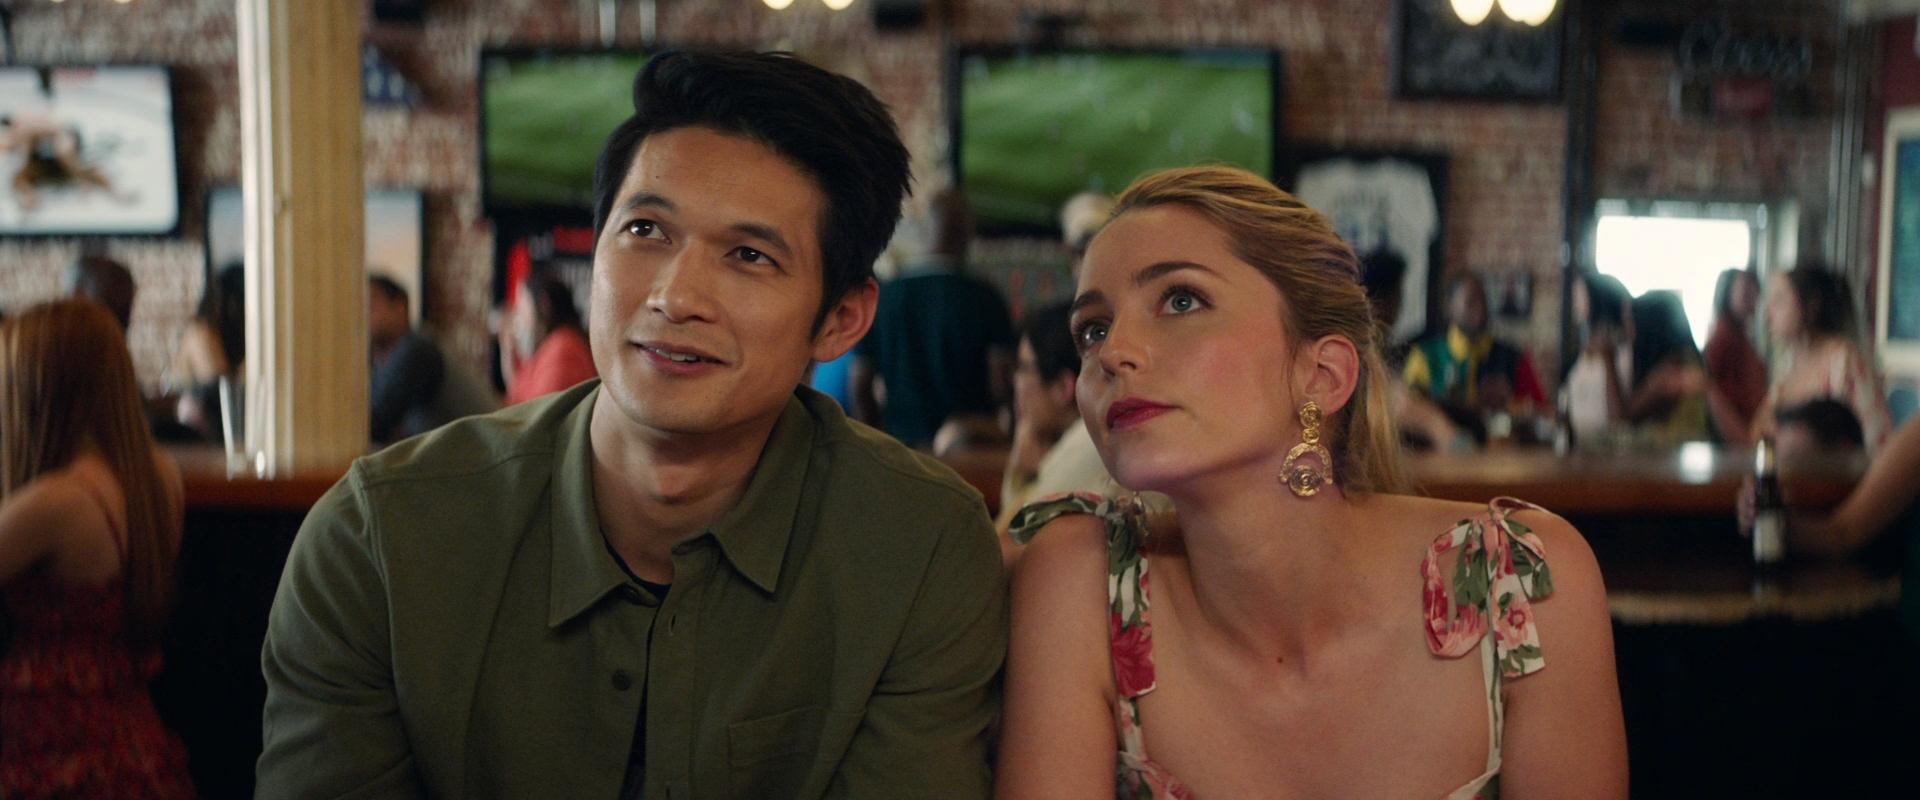 Para toda la Vida (2020) 1080p WEB-DL AMZN Latino